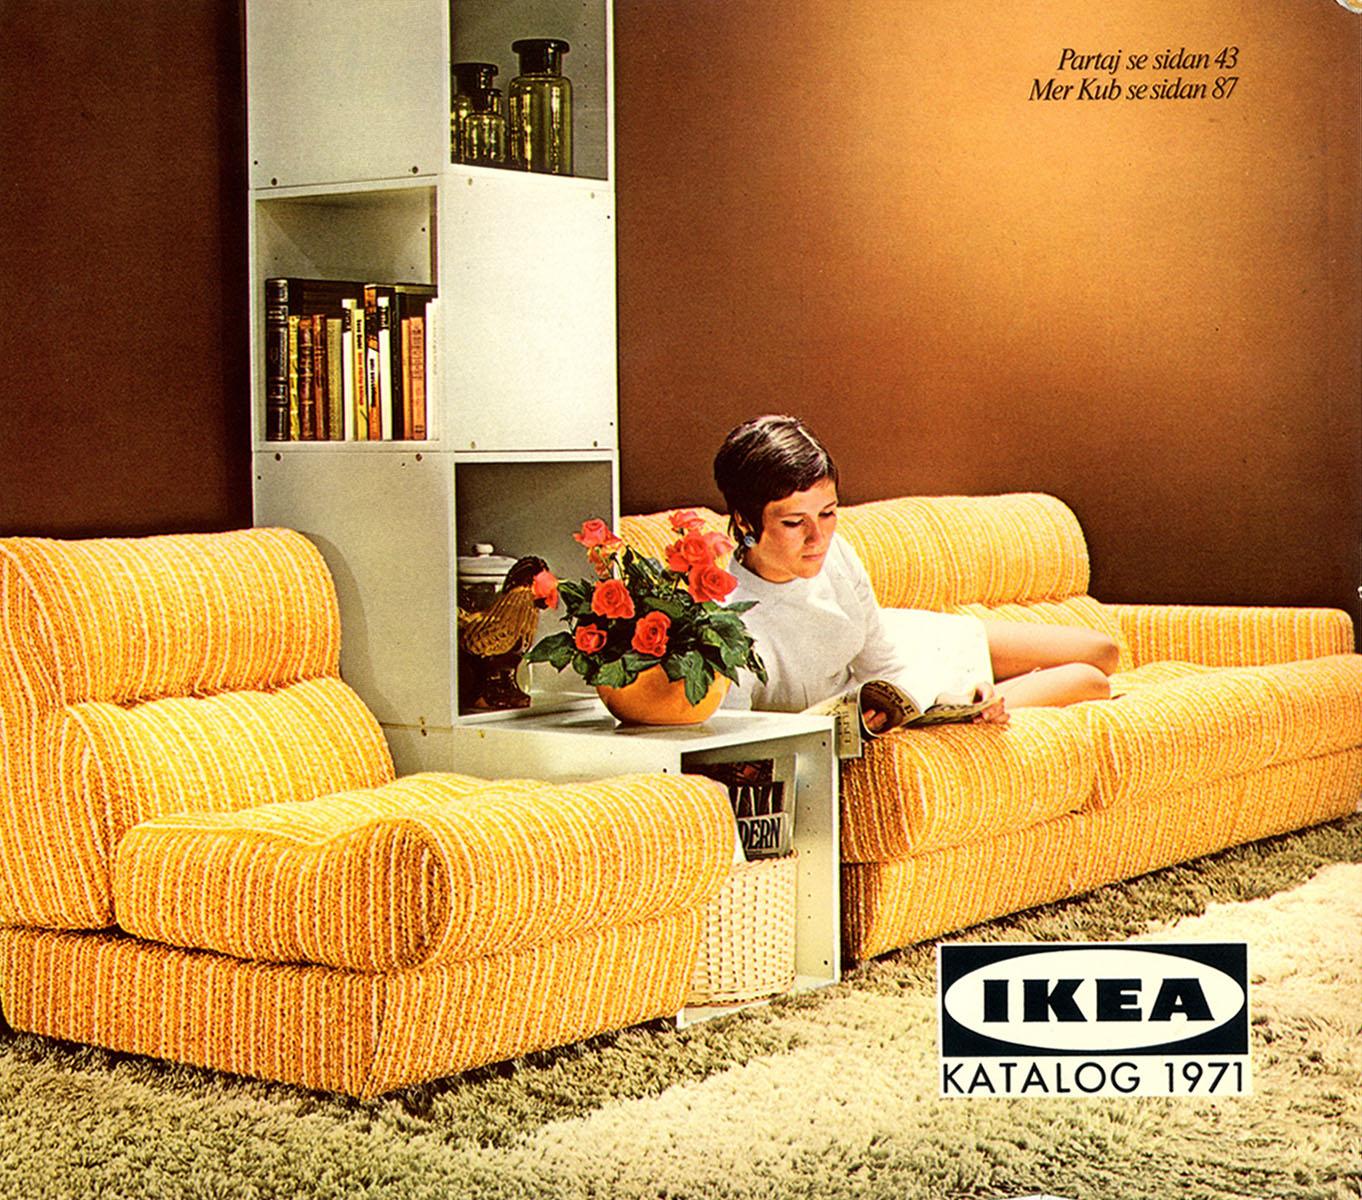 IKEA 1971 Catalog   Interior Design Ideas.